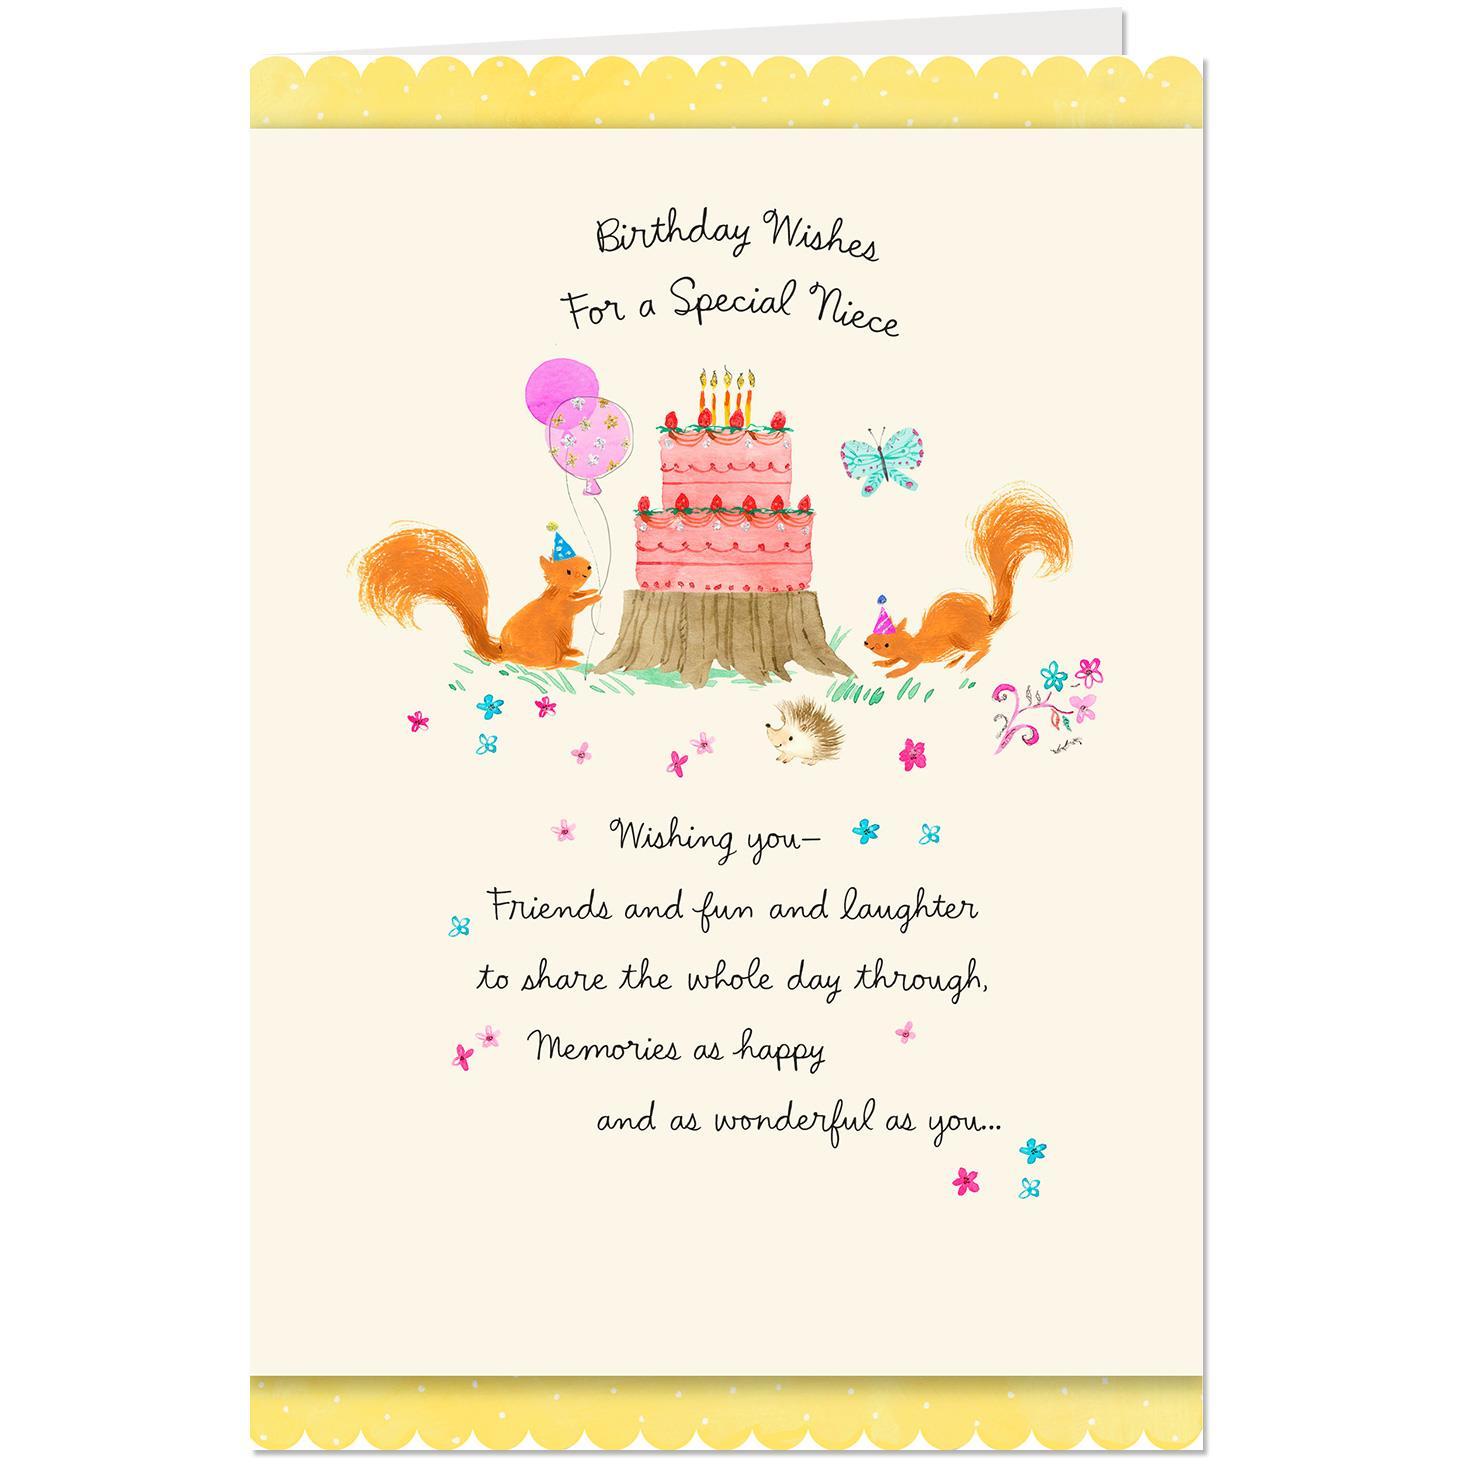 Wishing You Memories As Wonderful Birthday Card For Niece